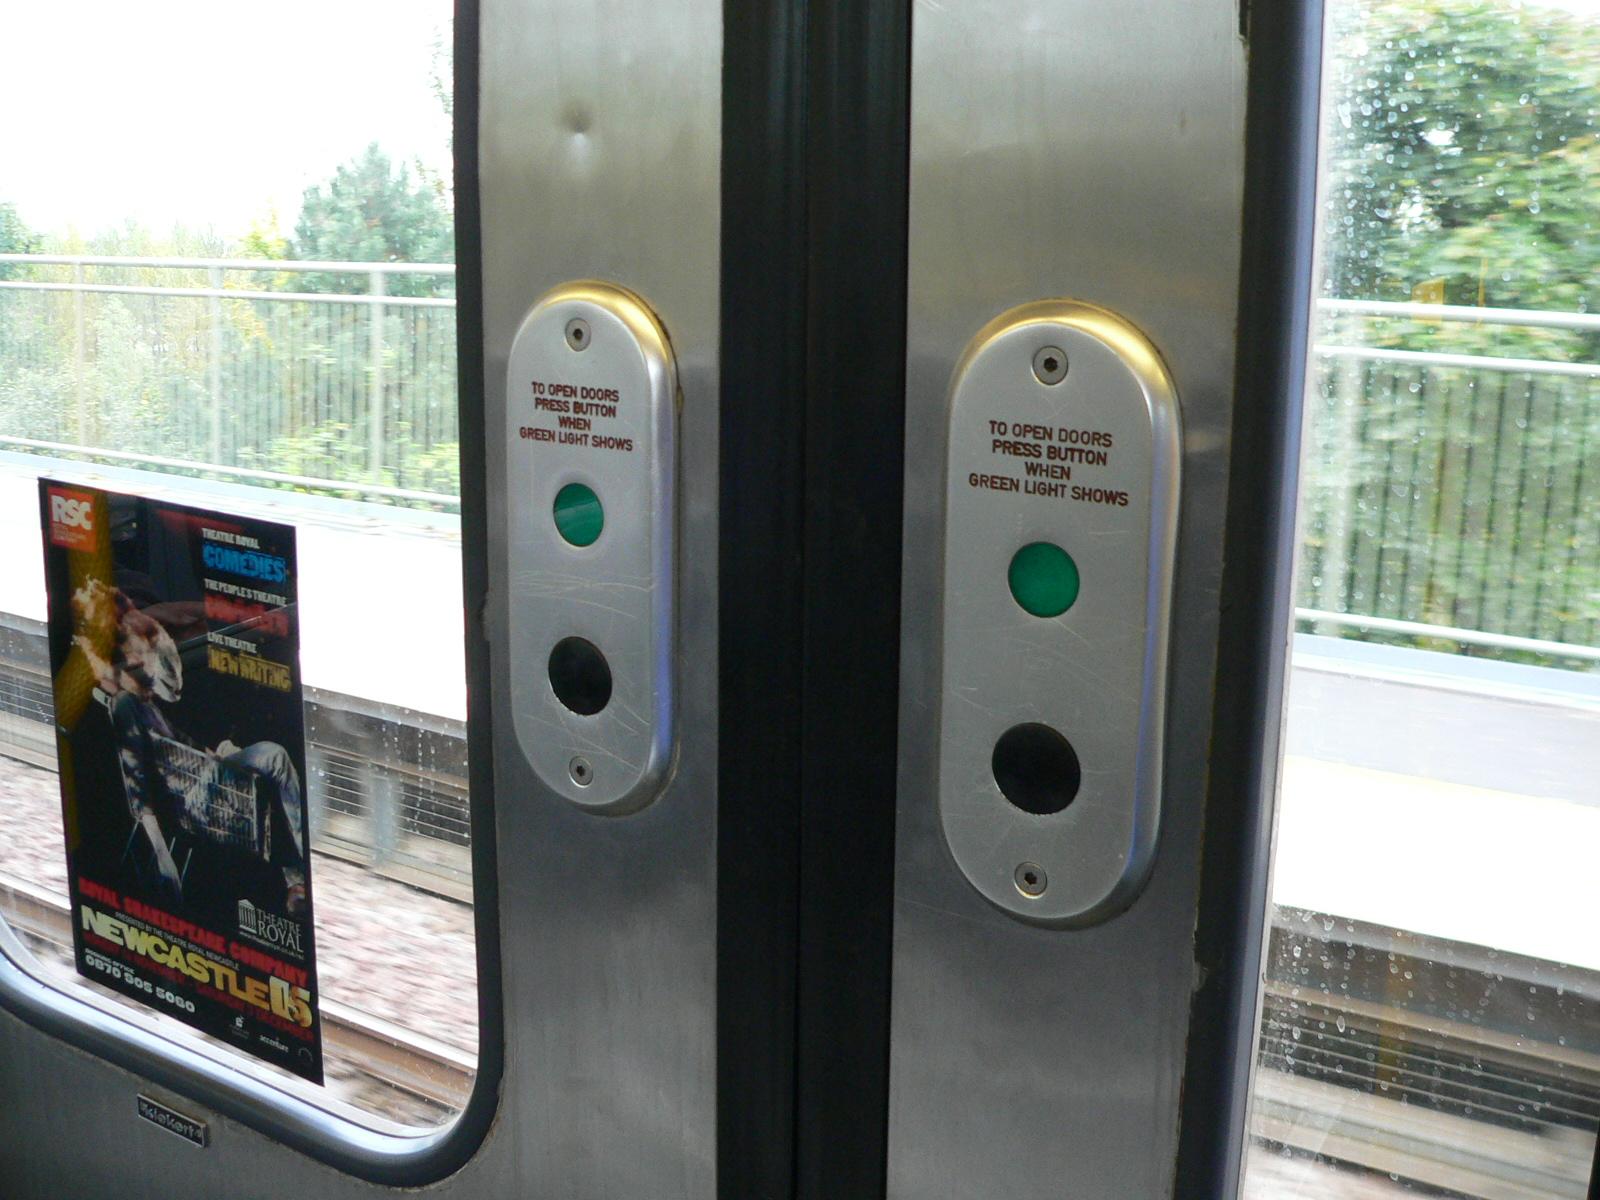 FileTyne and Wear Metro - prototype door buttons.jpg & File:Tyne and Wear Metro - prototype door buttons.jpg - Wikimedia ... pezcame.com